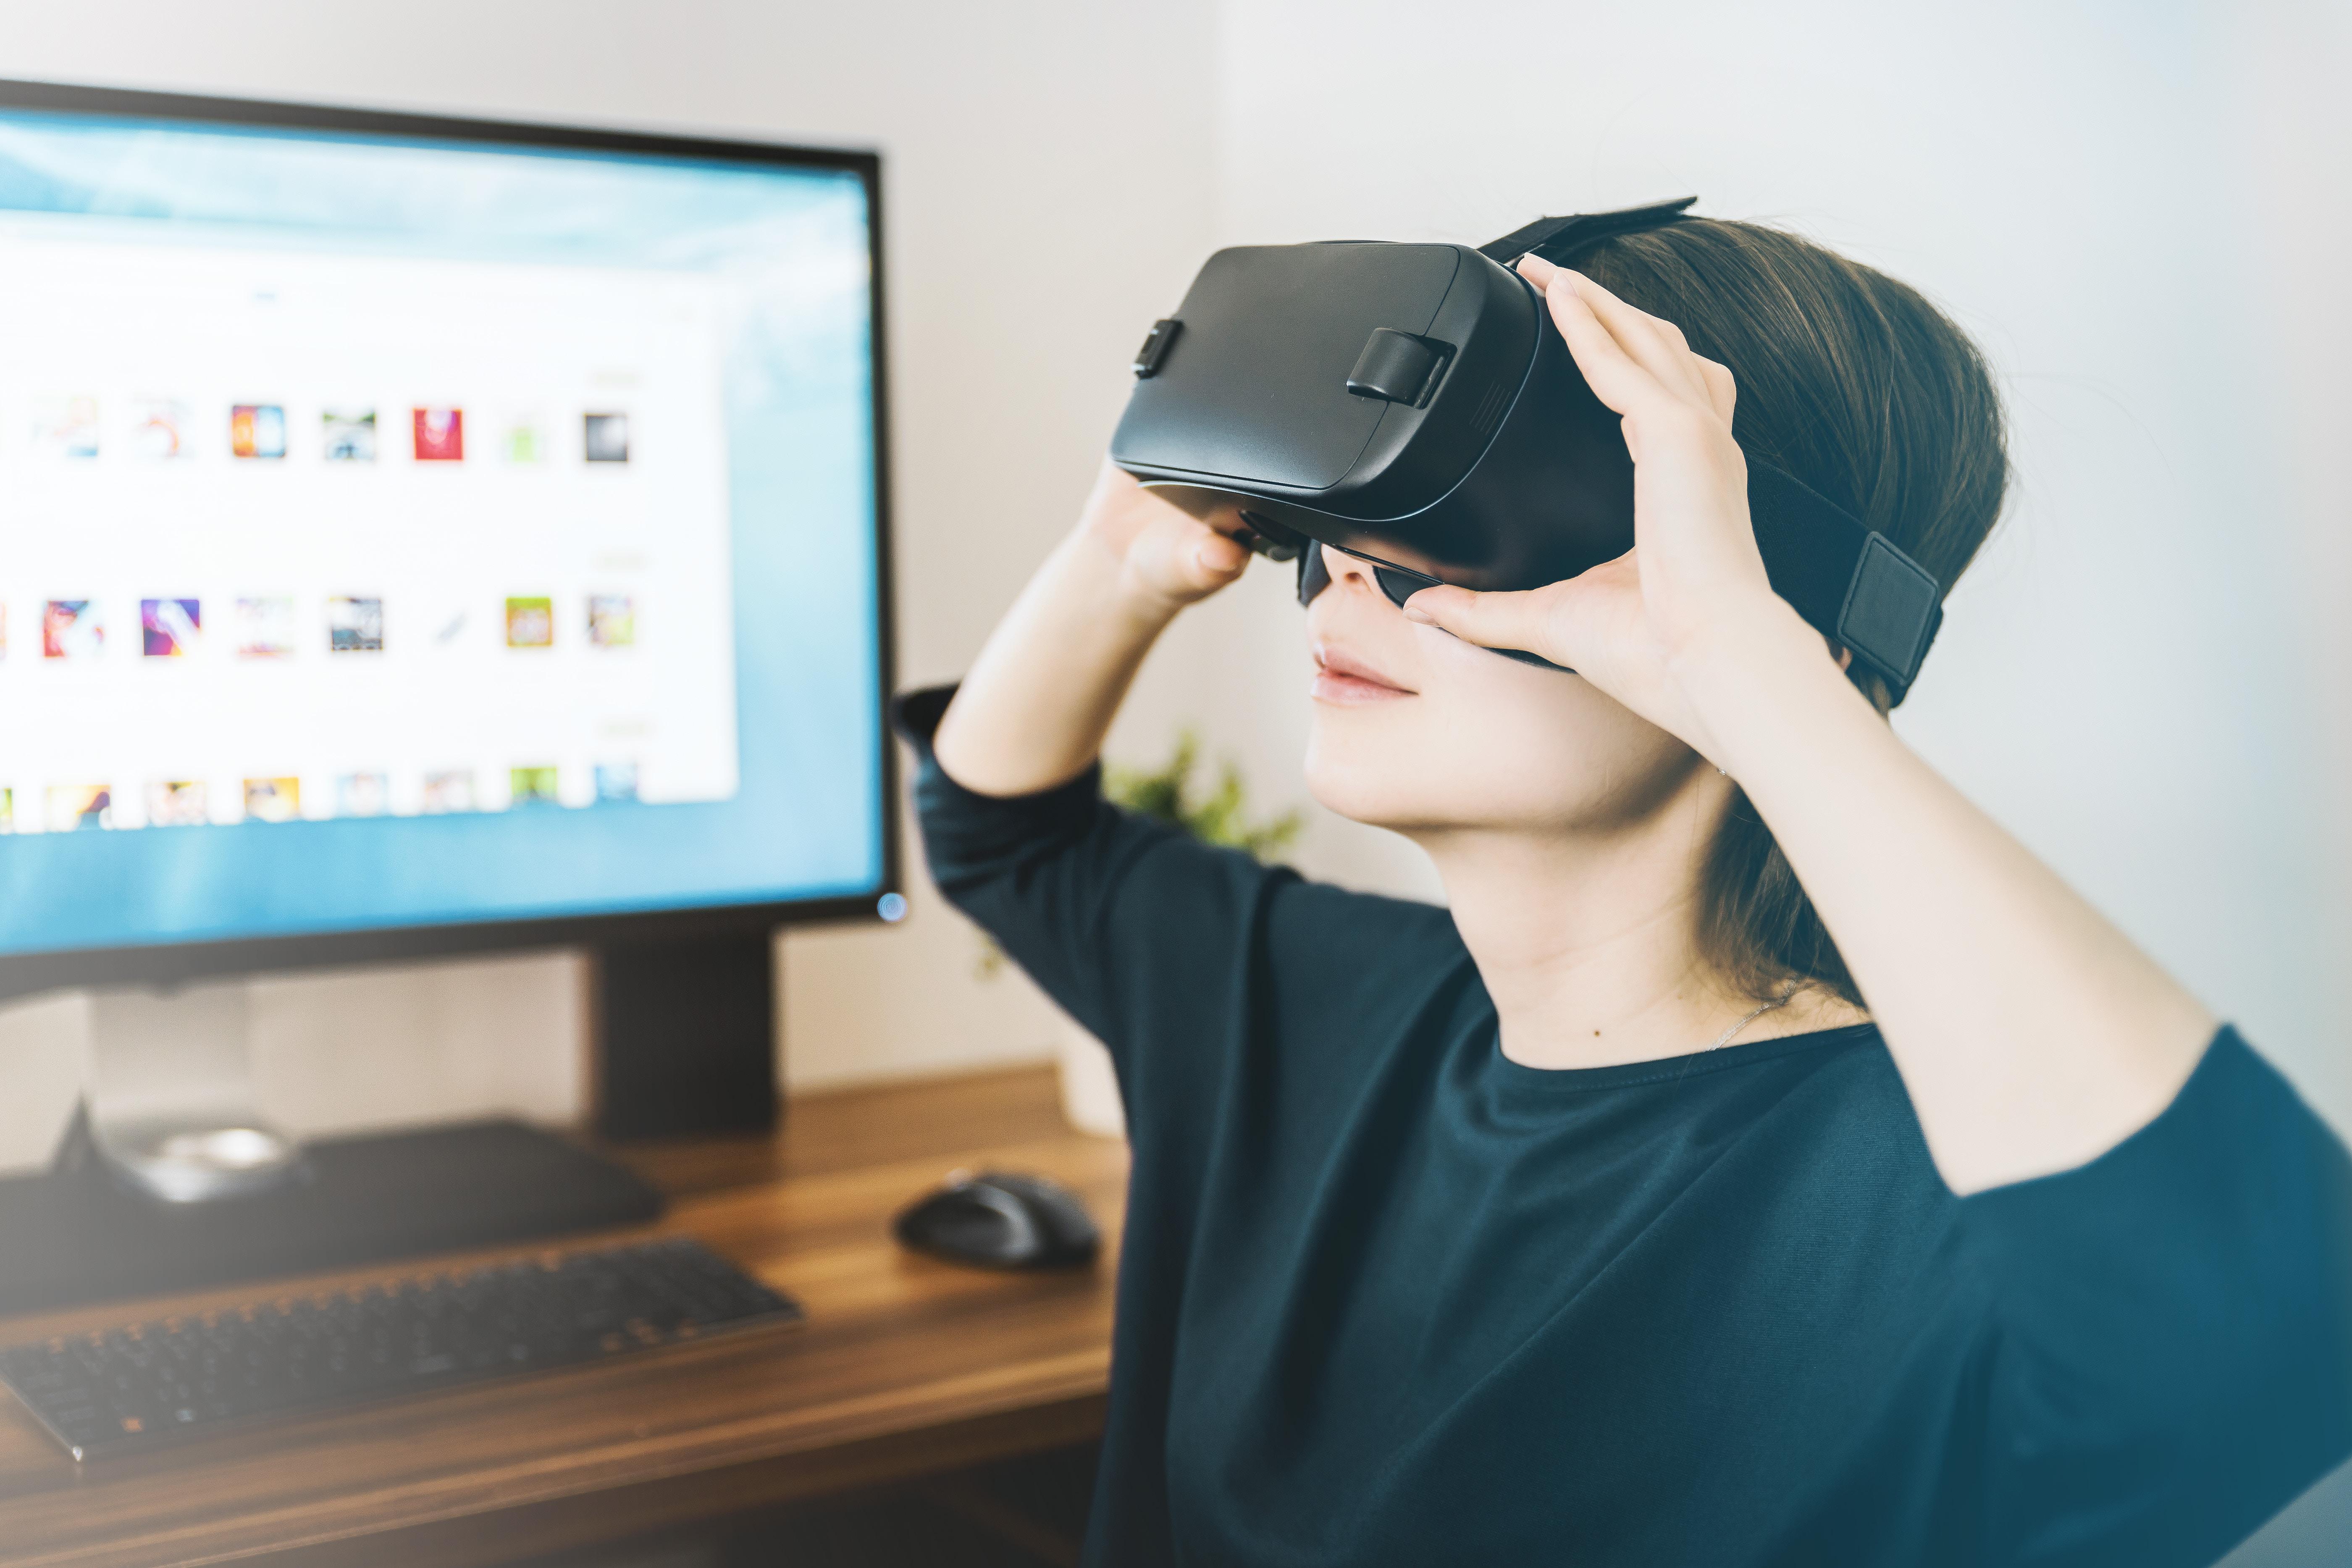 A person using a virtual reality headset.